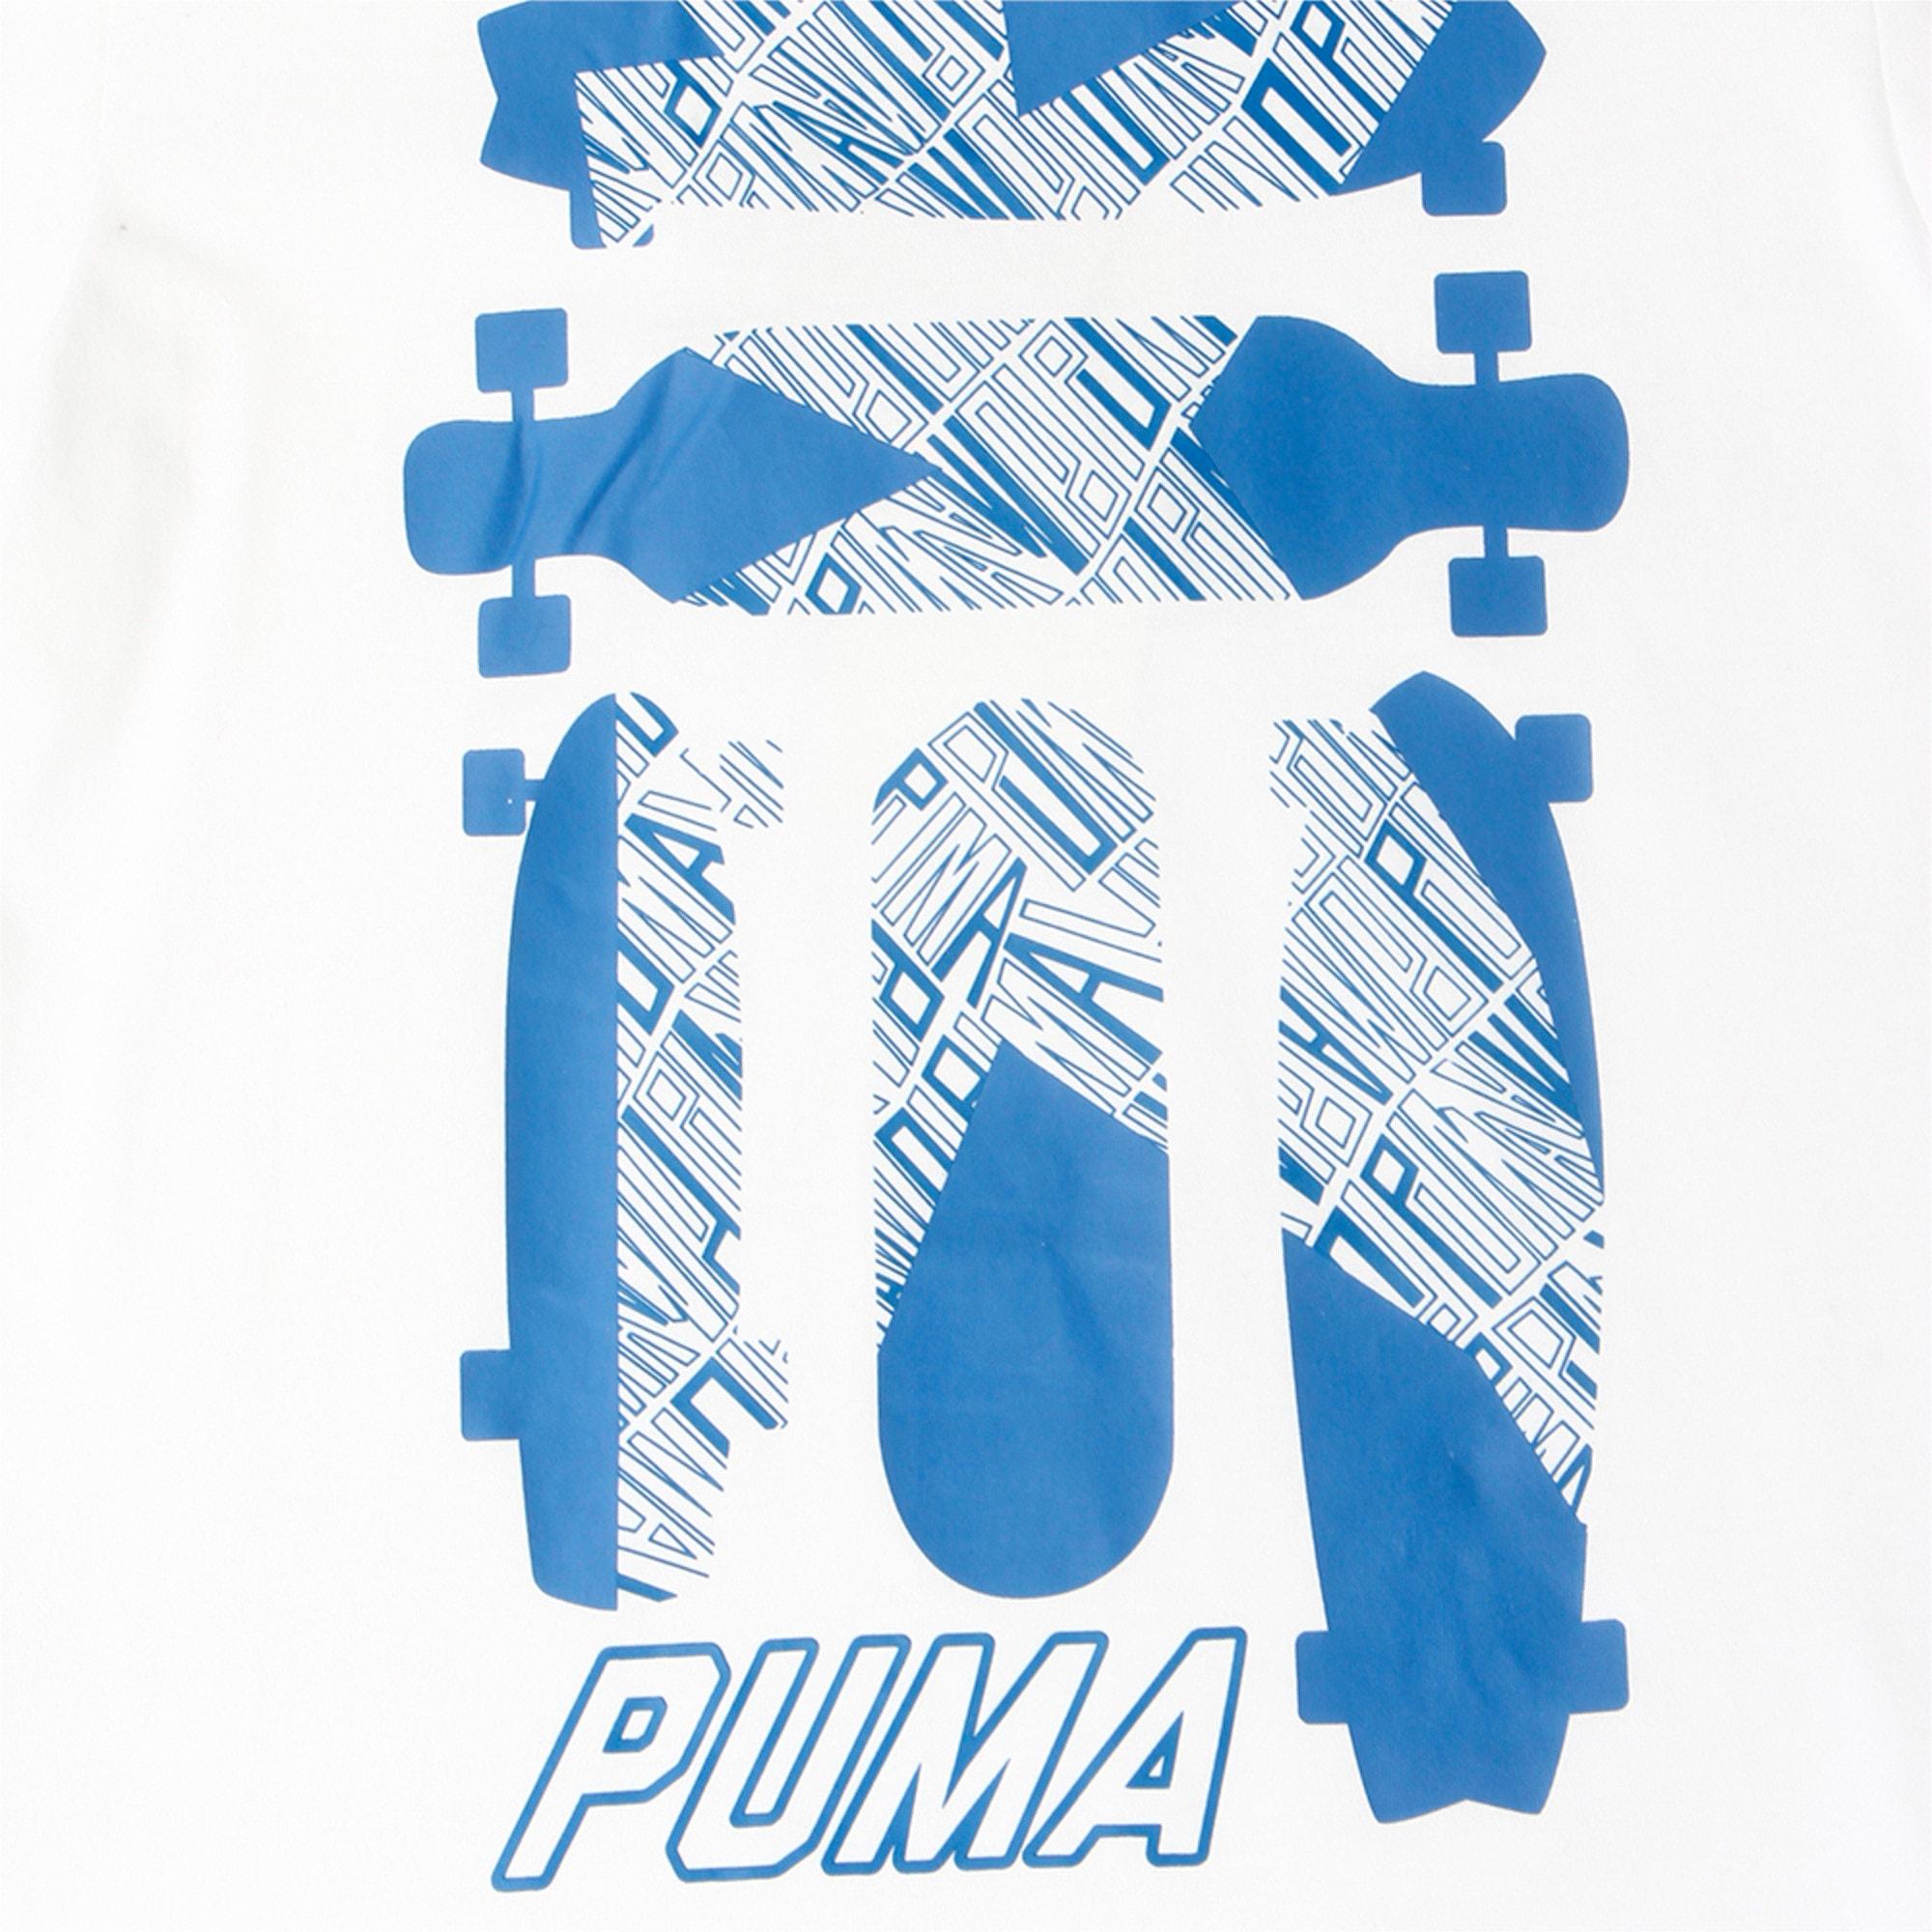 Thumbnail 1 of Skate Graphic Tee, Puma White, medium-IND